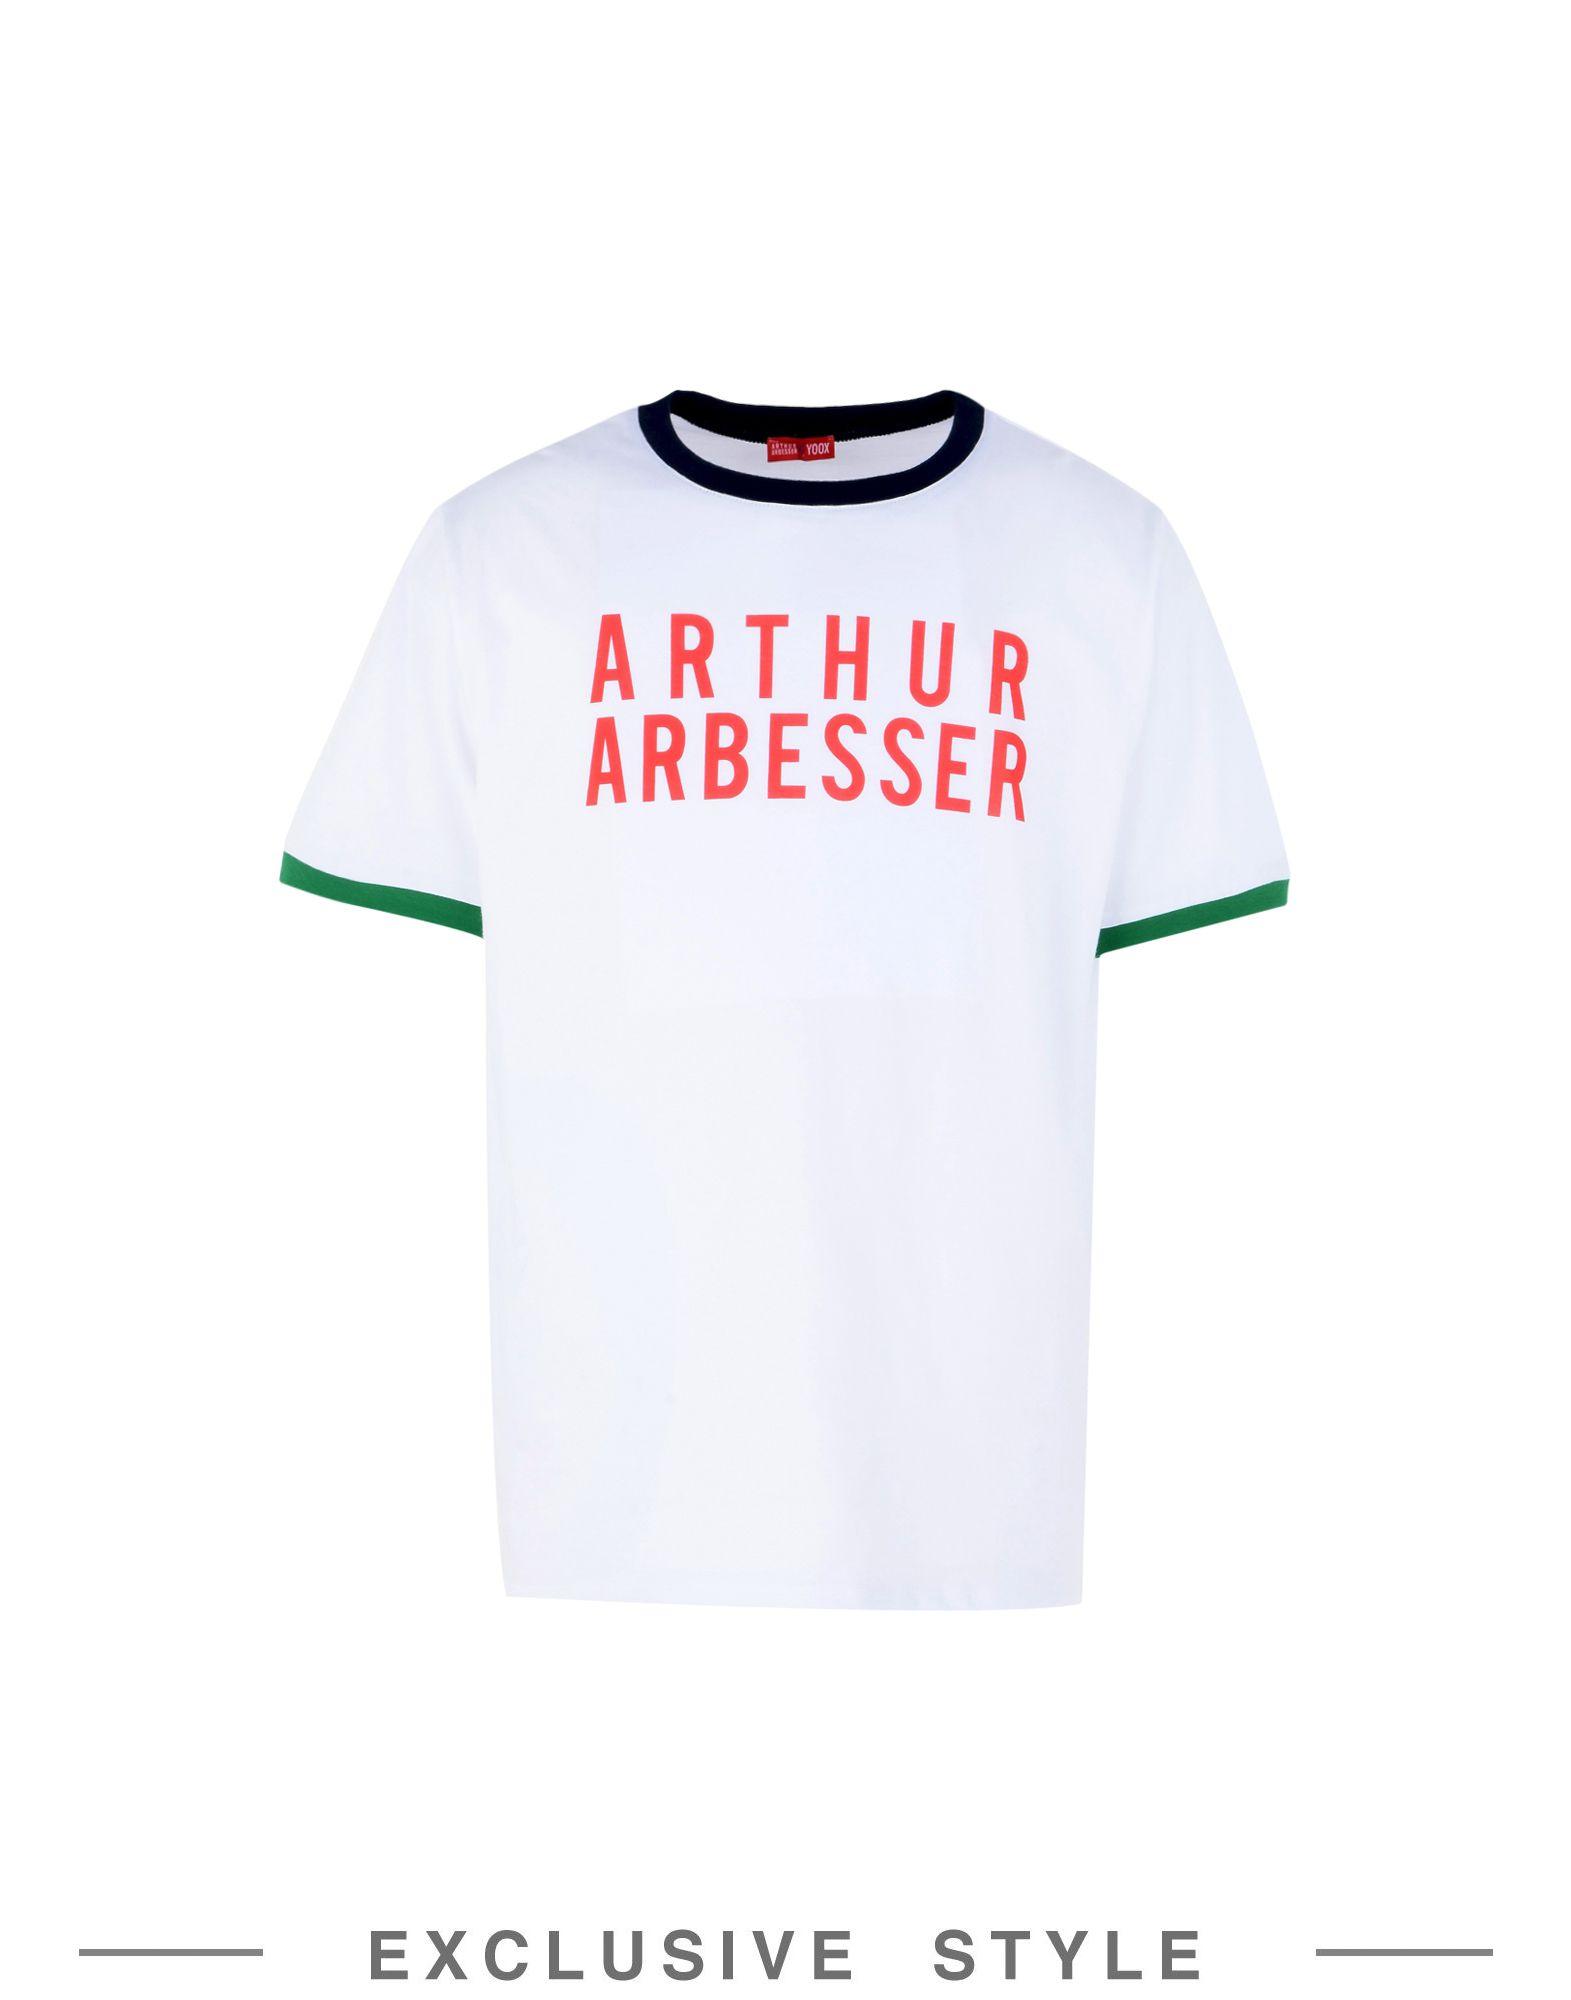 ARTHUR ARBESSER x YOOX Футболка arthur arbesser x yoox футболка